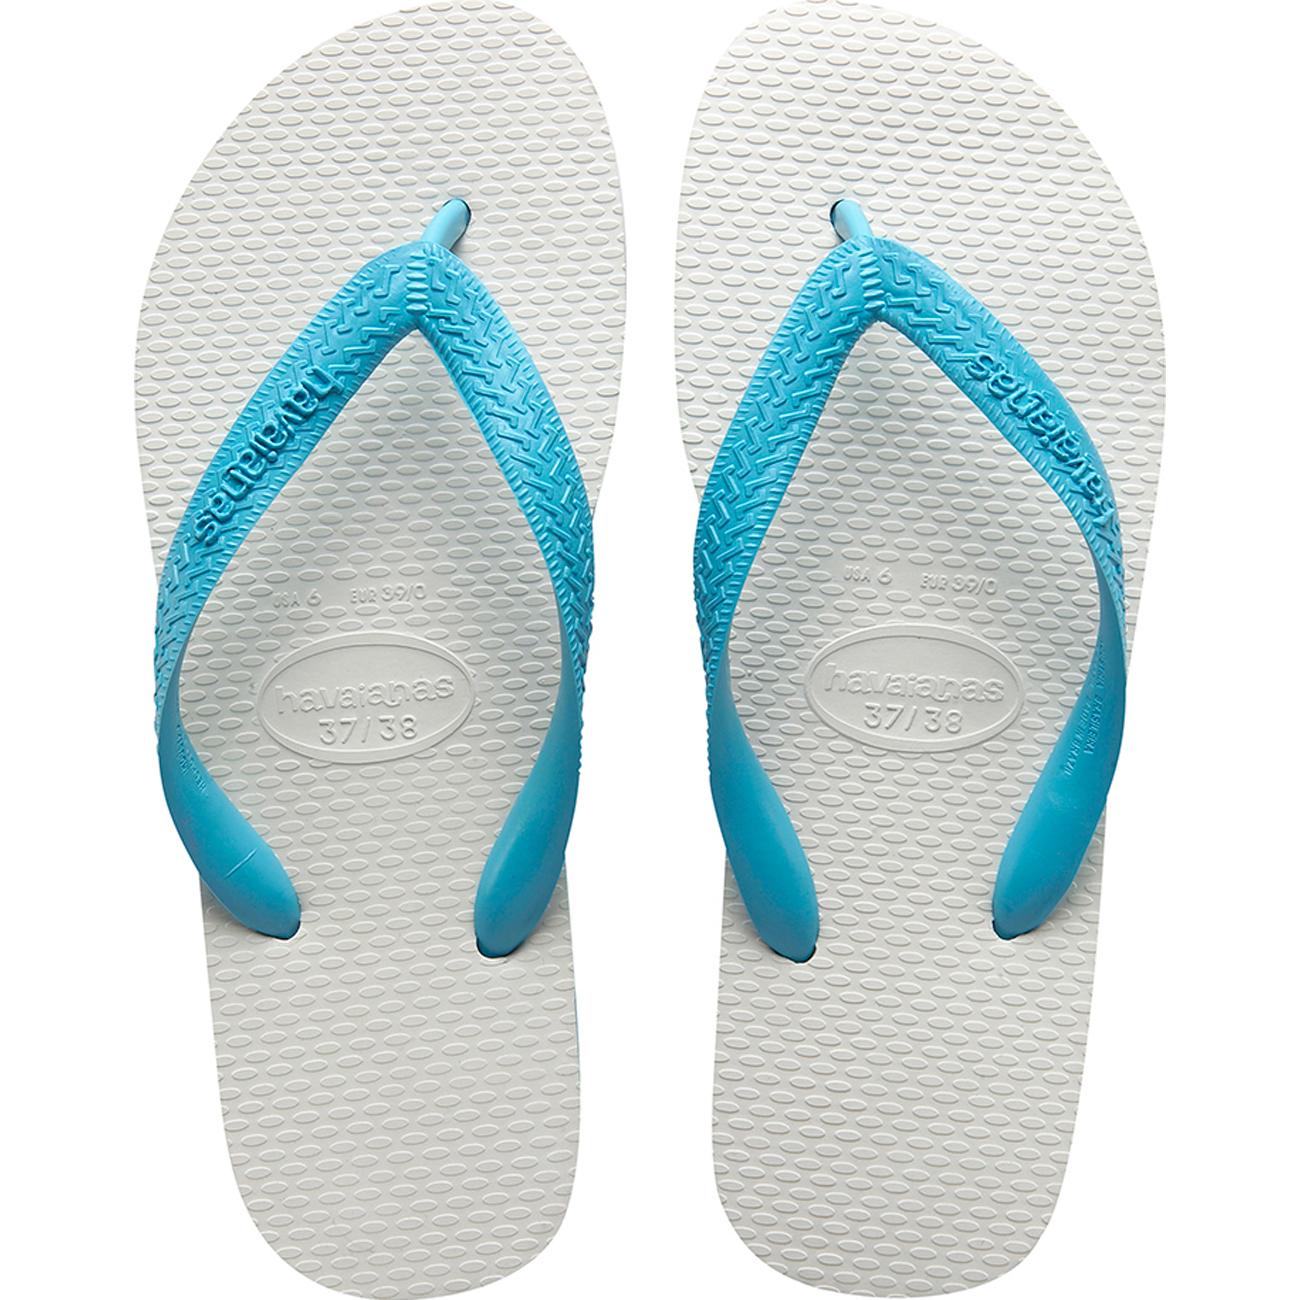 Sandalia Havaianas Tradicional Azul 39/0